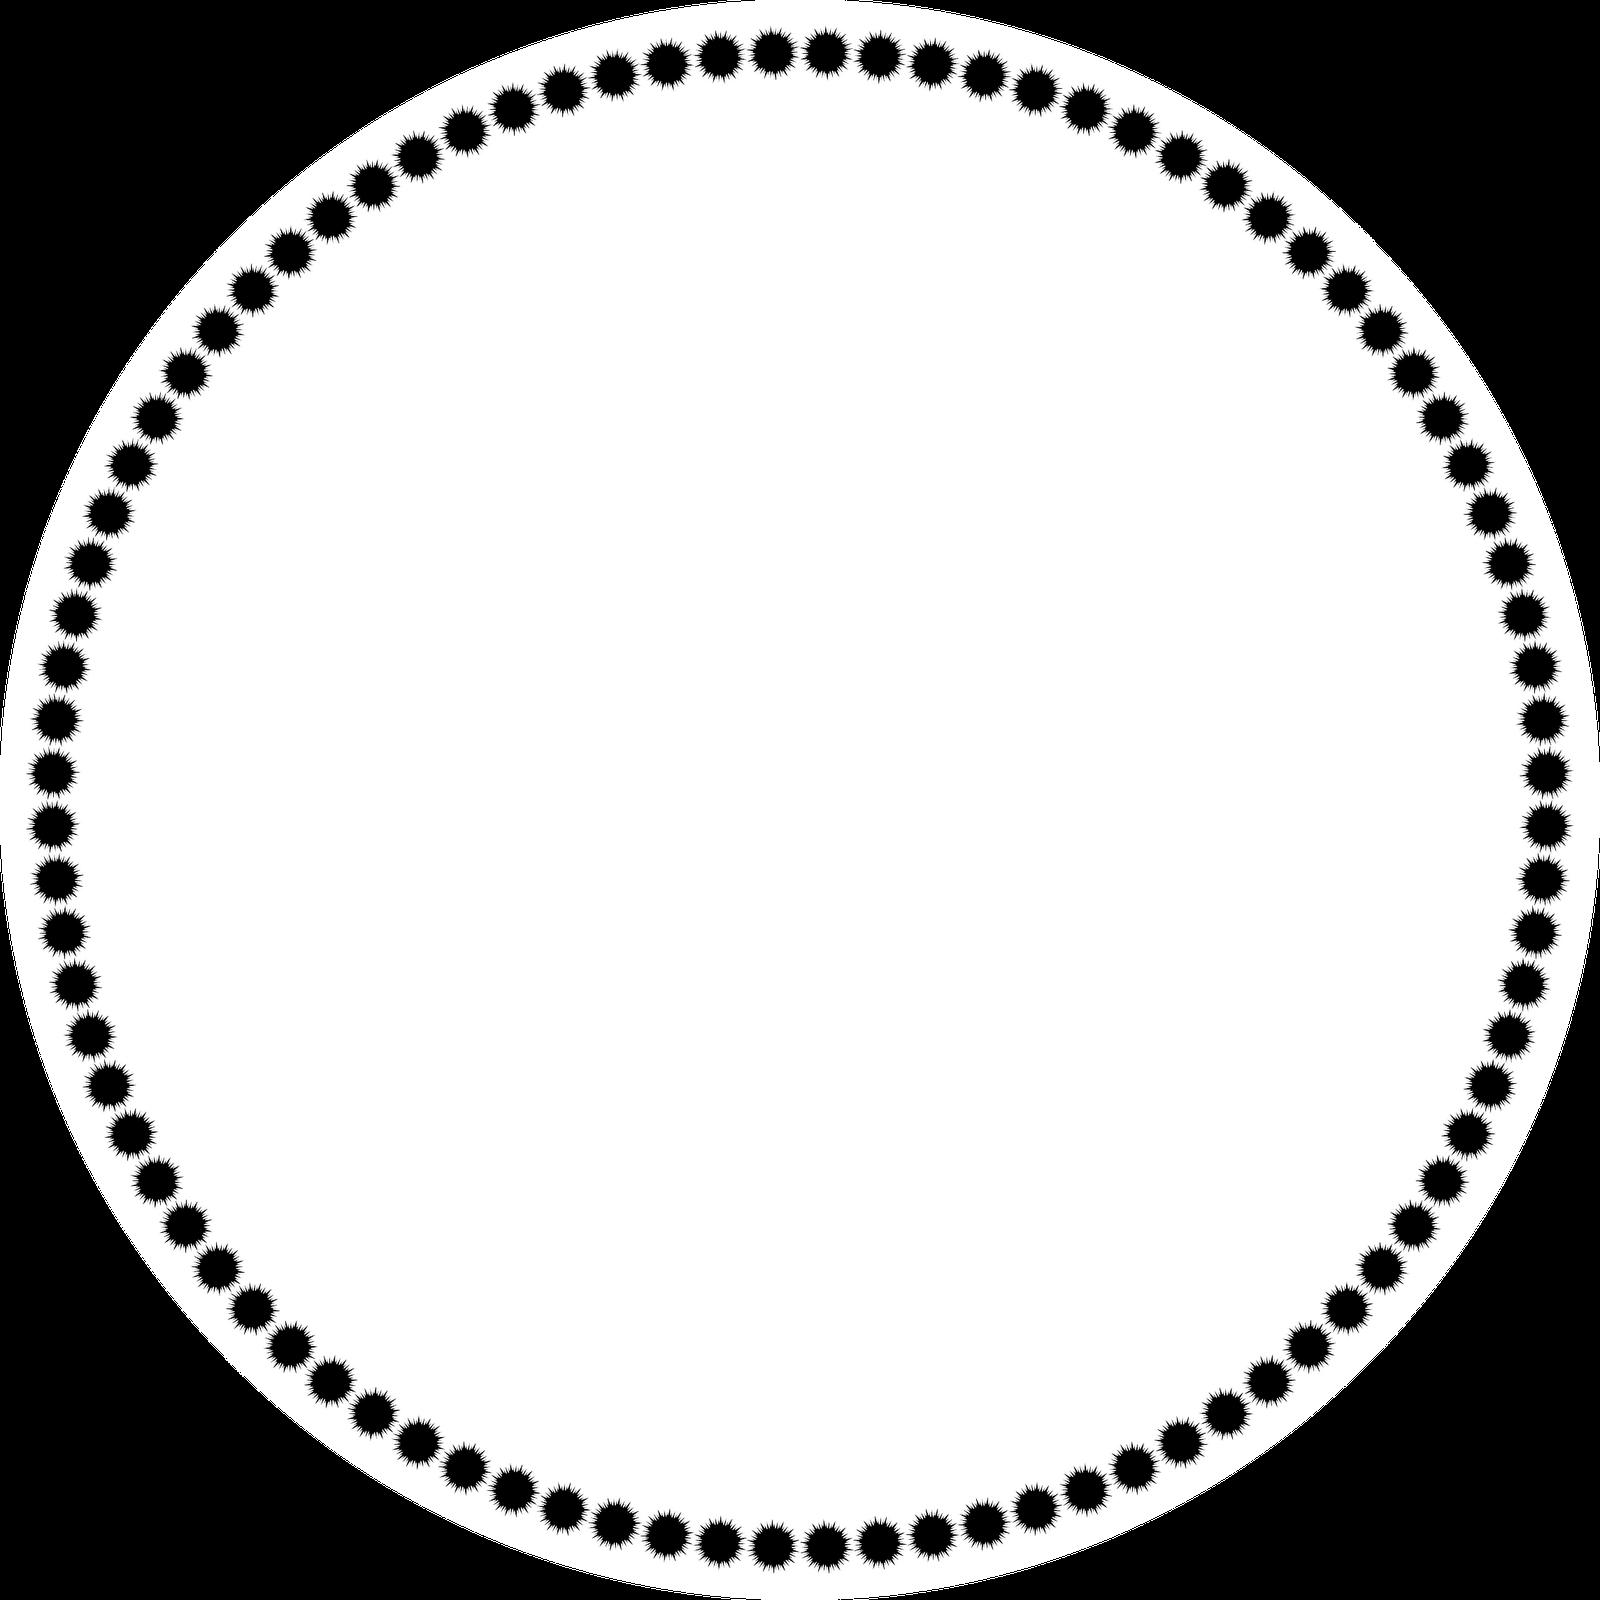 Circle Border Clip Art - Cliparts.co